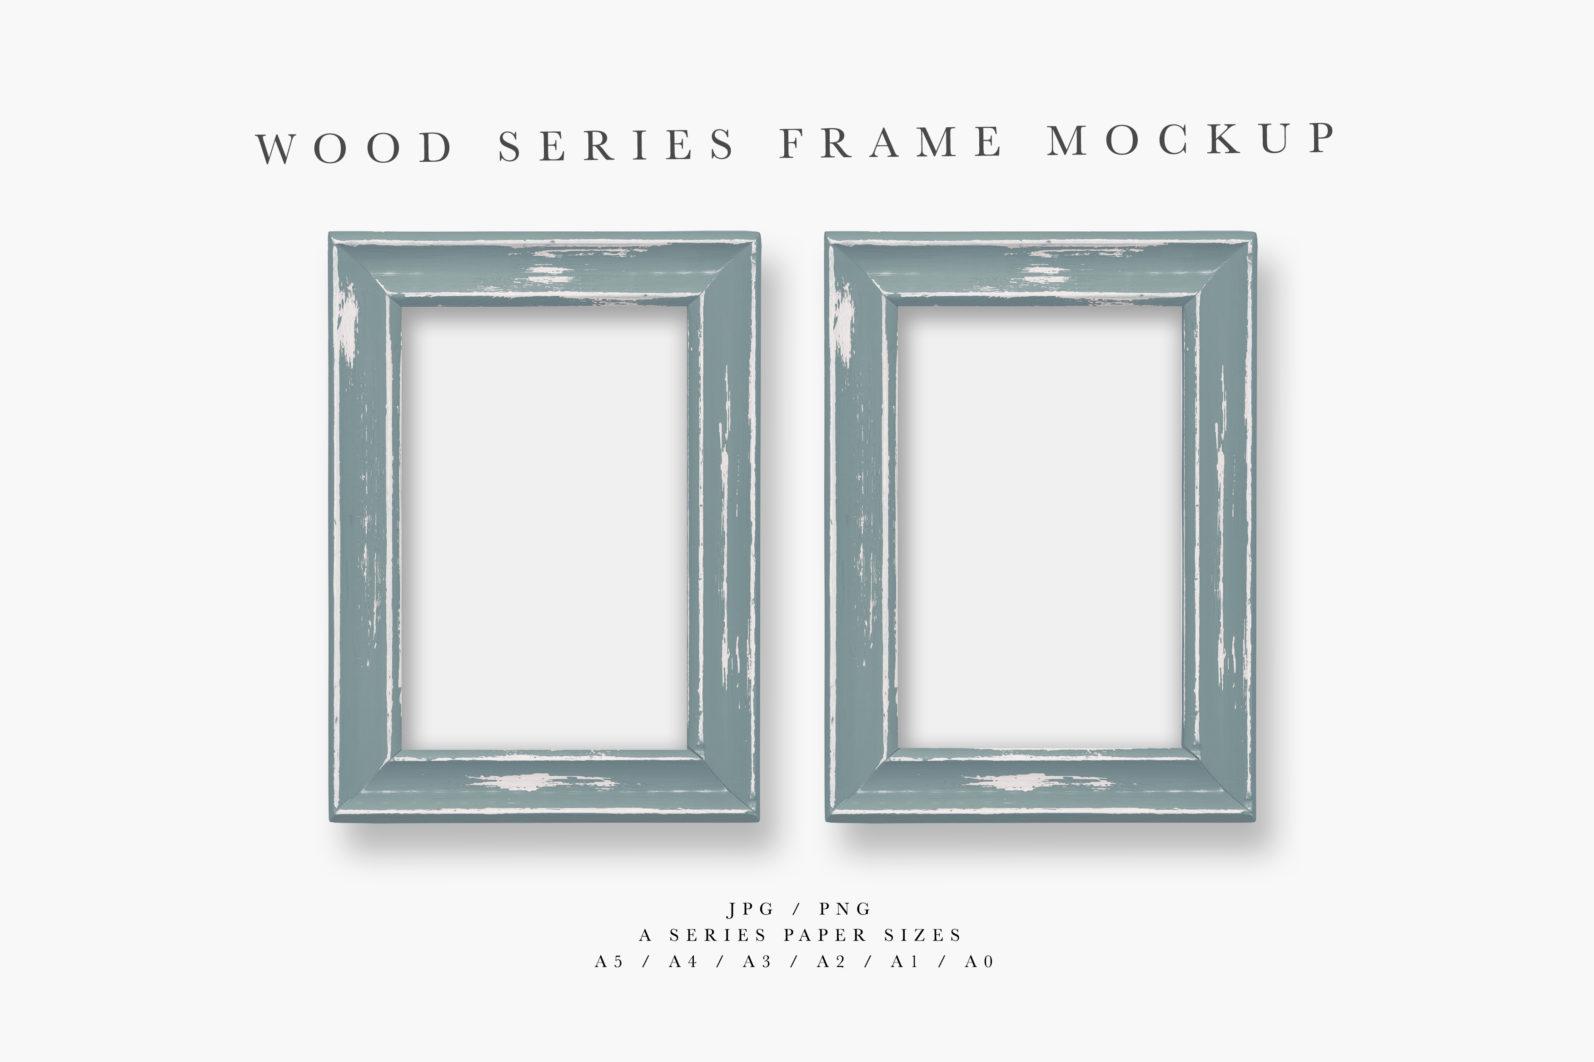 Frame Mockup, Blue Wood Portrait Photo Frame, Two Frame Mockup, PSD - Wood Series 1 Preview 3 scaled -